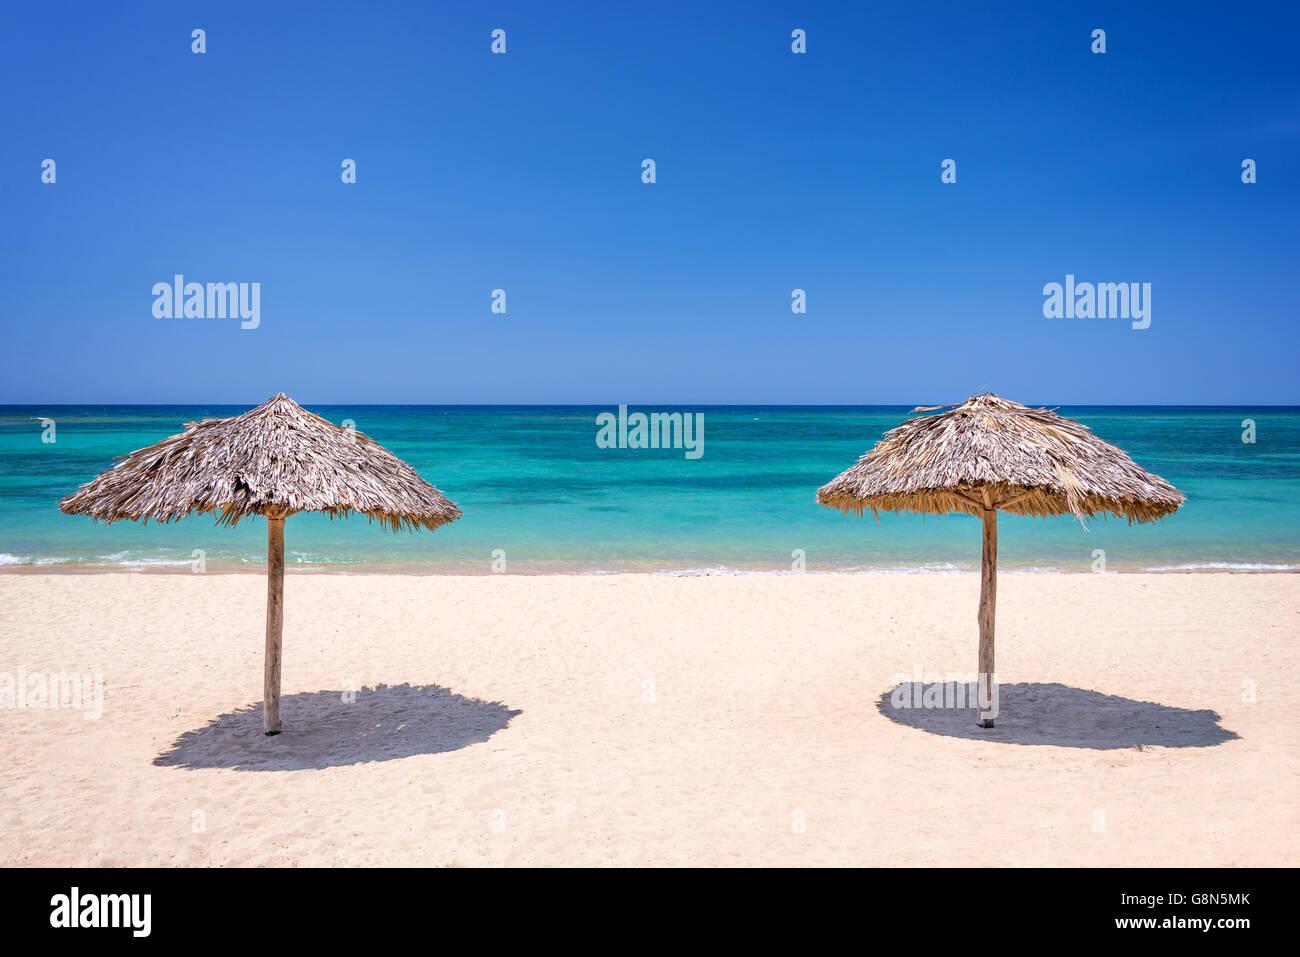 Straw umbrella on a beautiful tropical beach - Stock Image